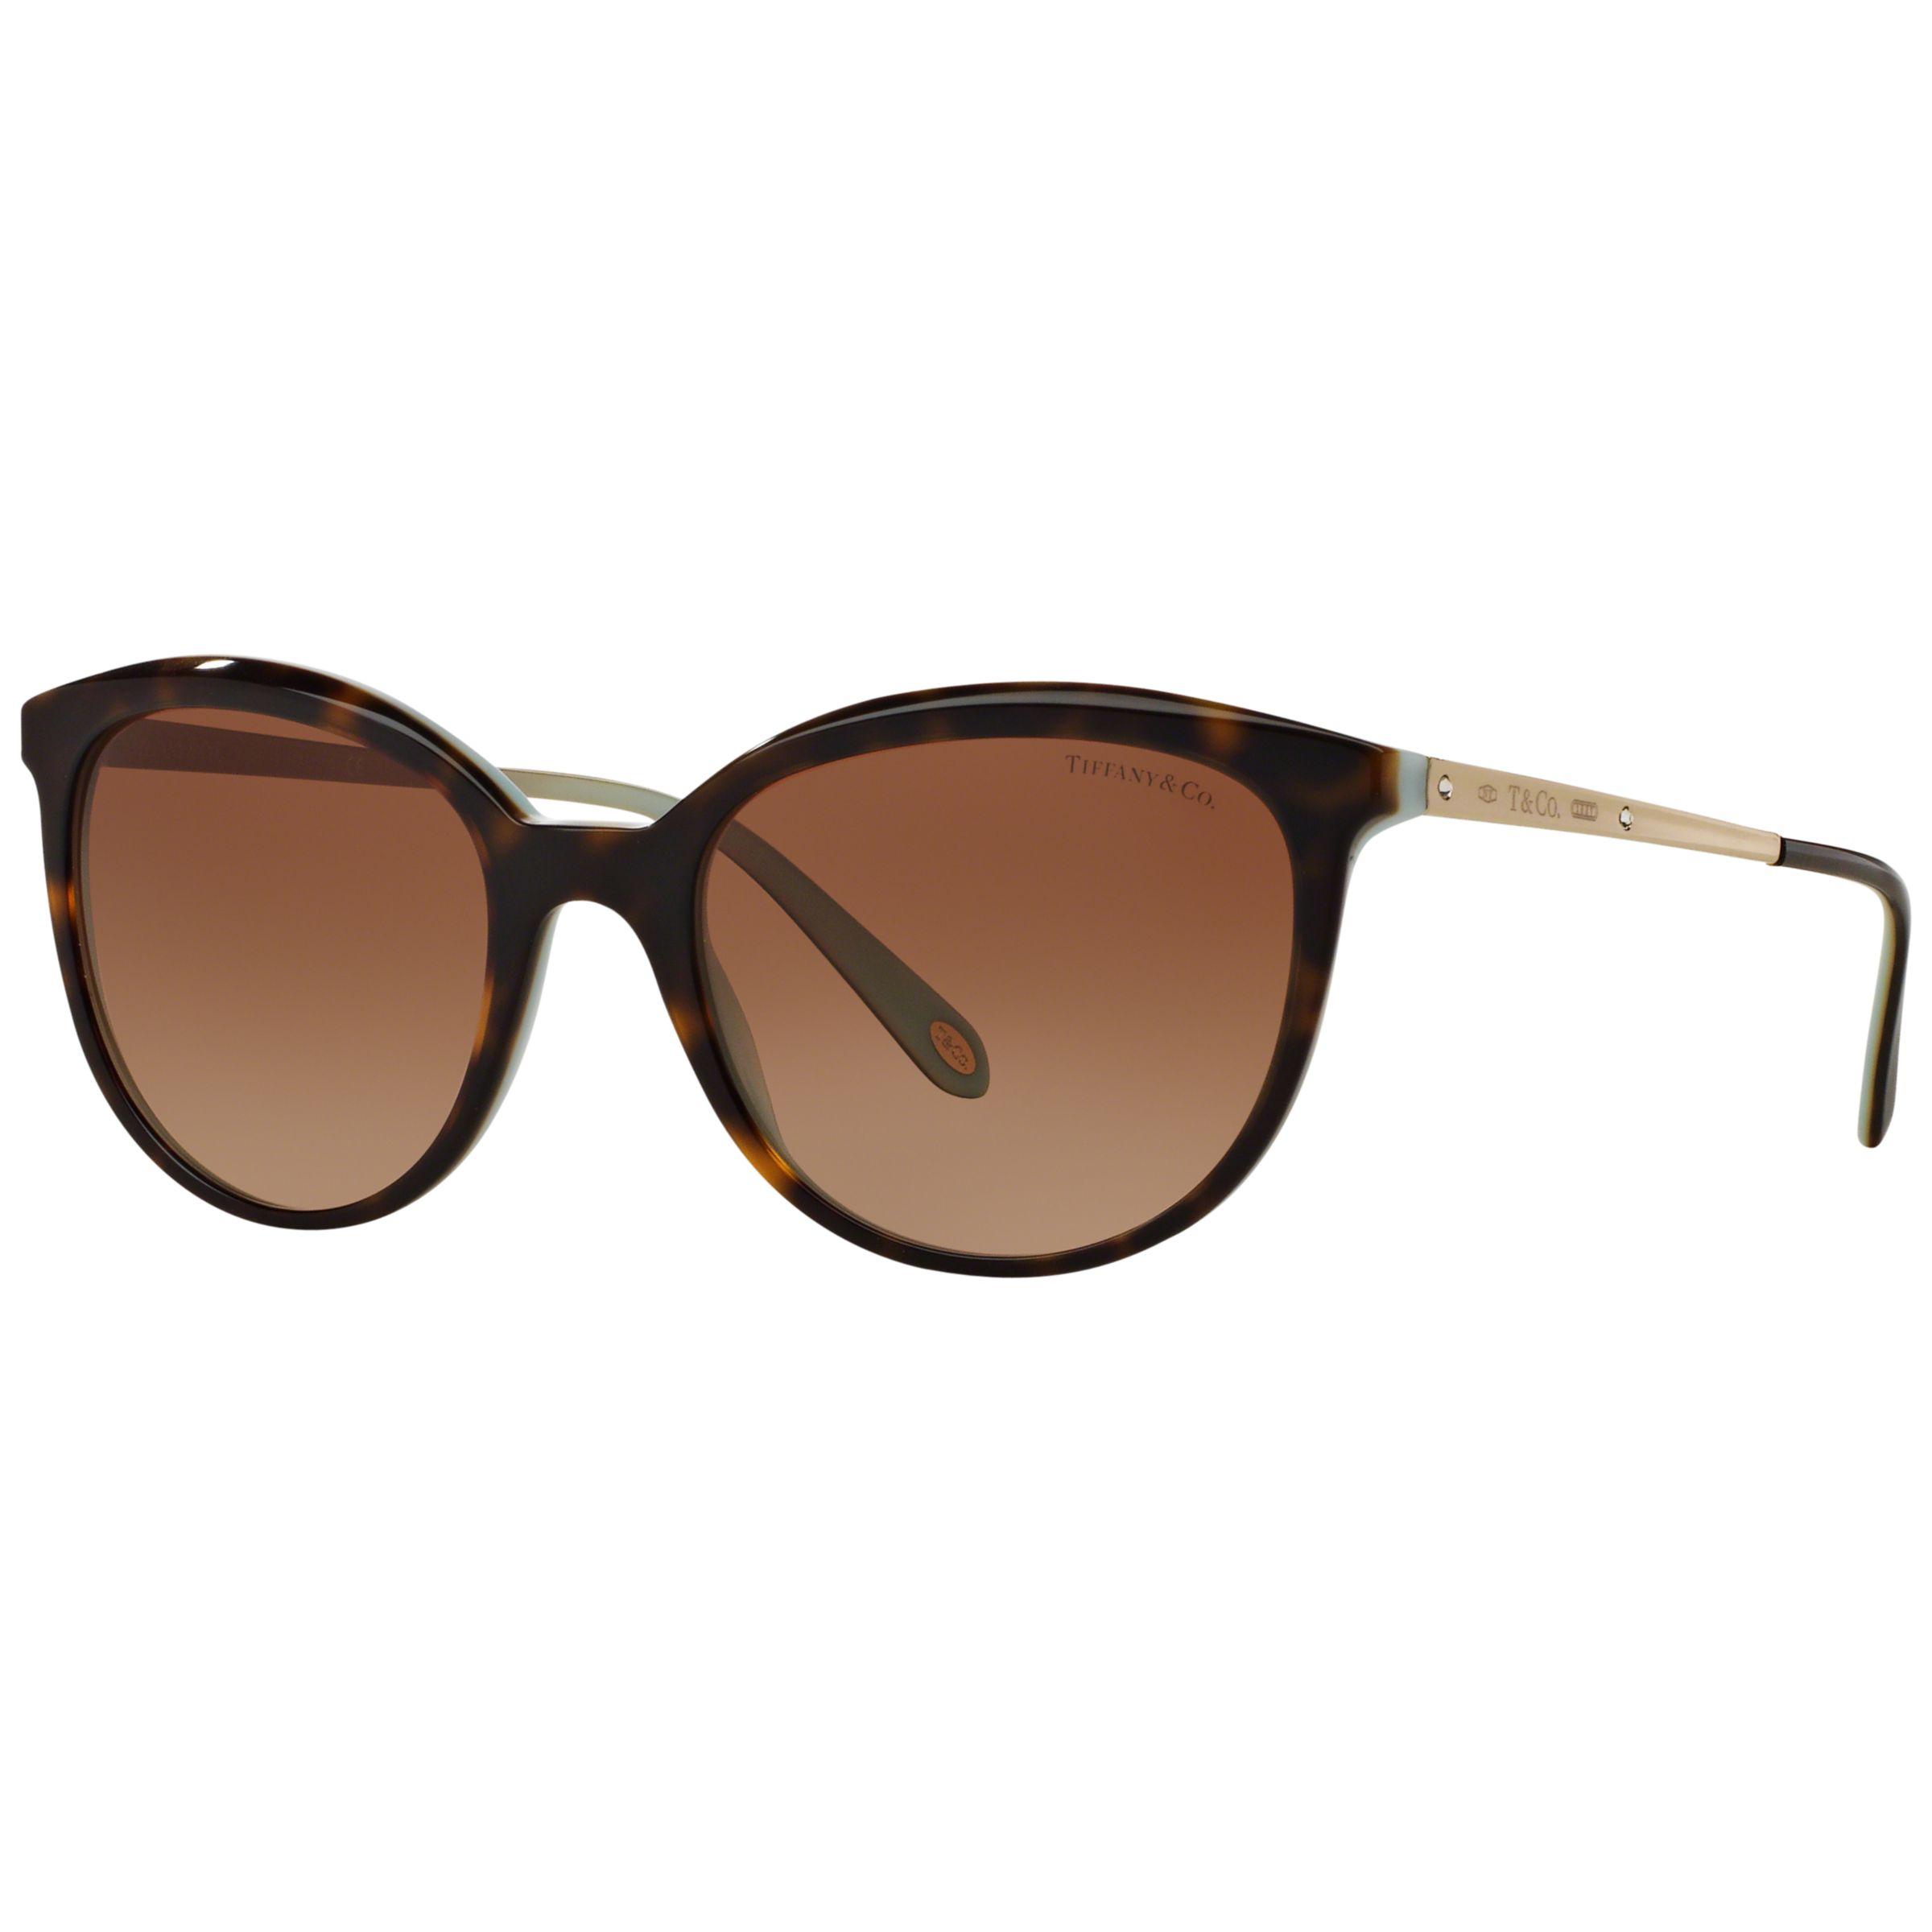 Tiffany & Co Tiffany & Co TF4117B Gradient Oval Sunglasses, Tortoise